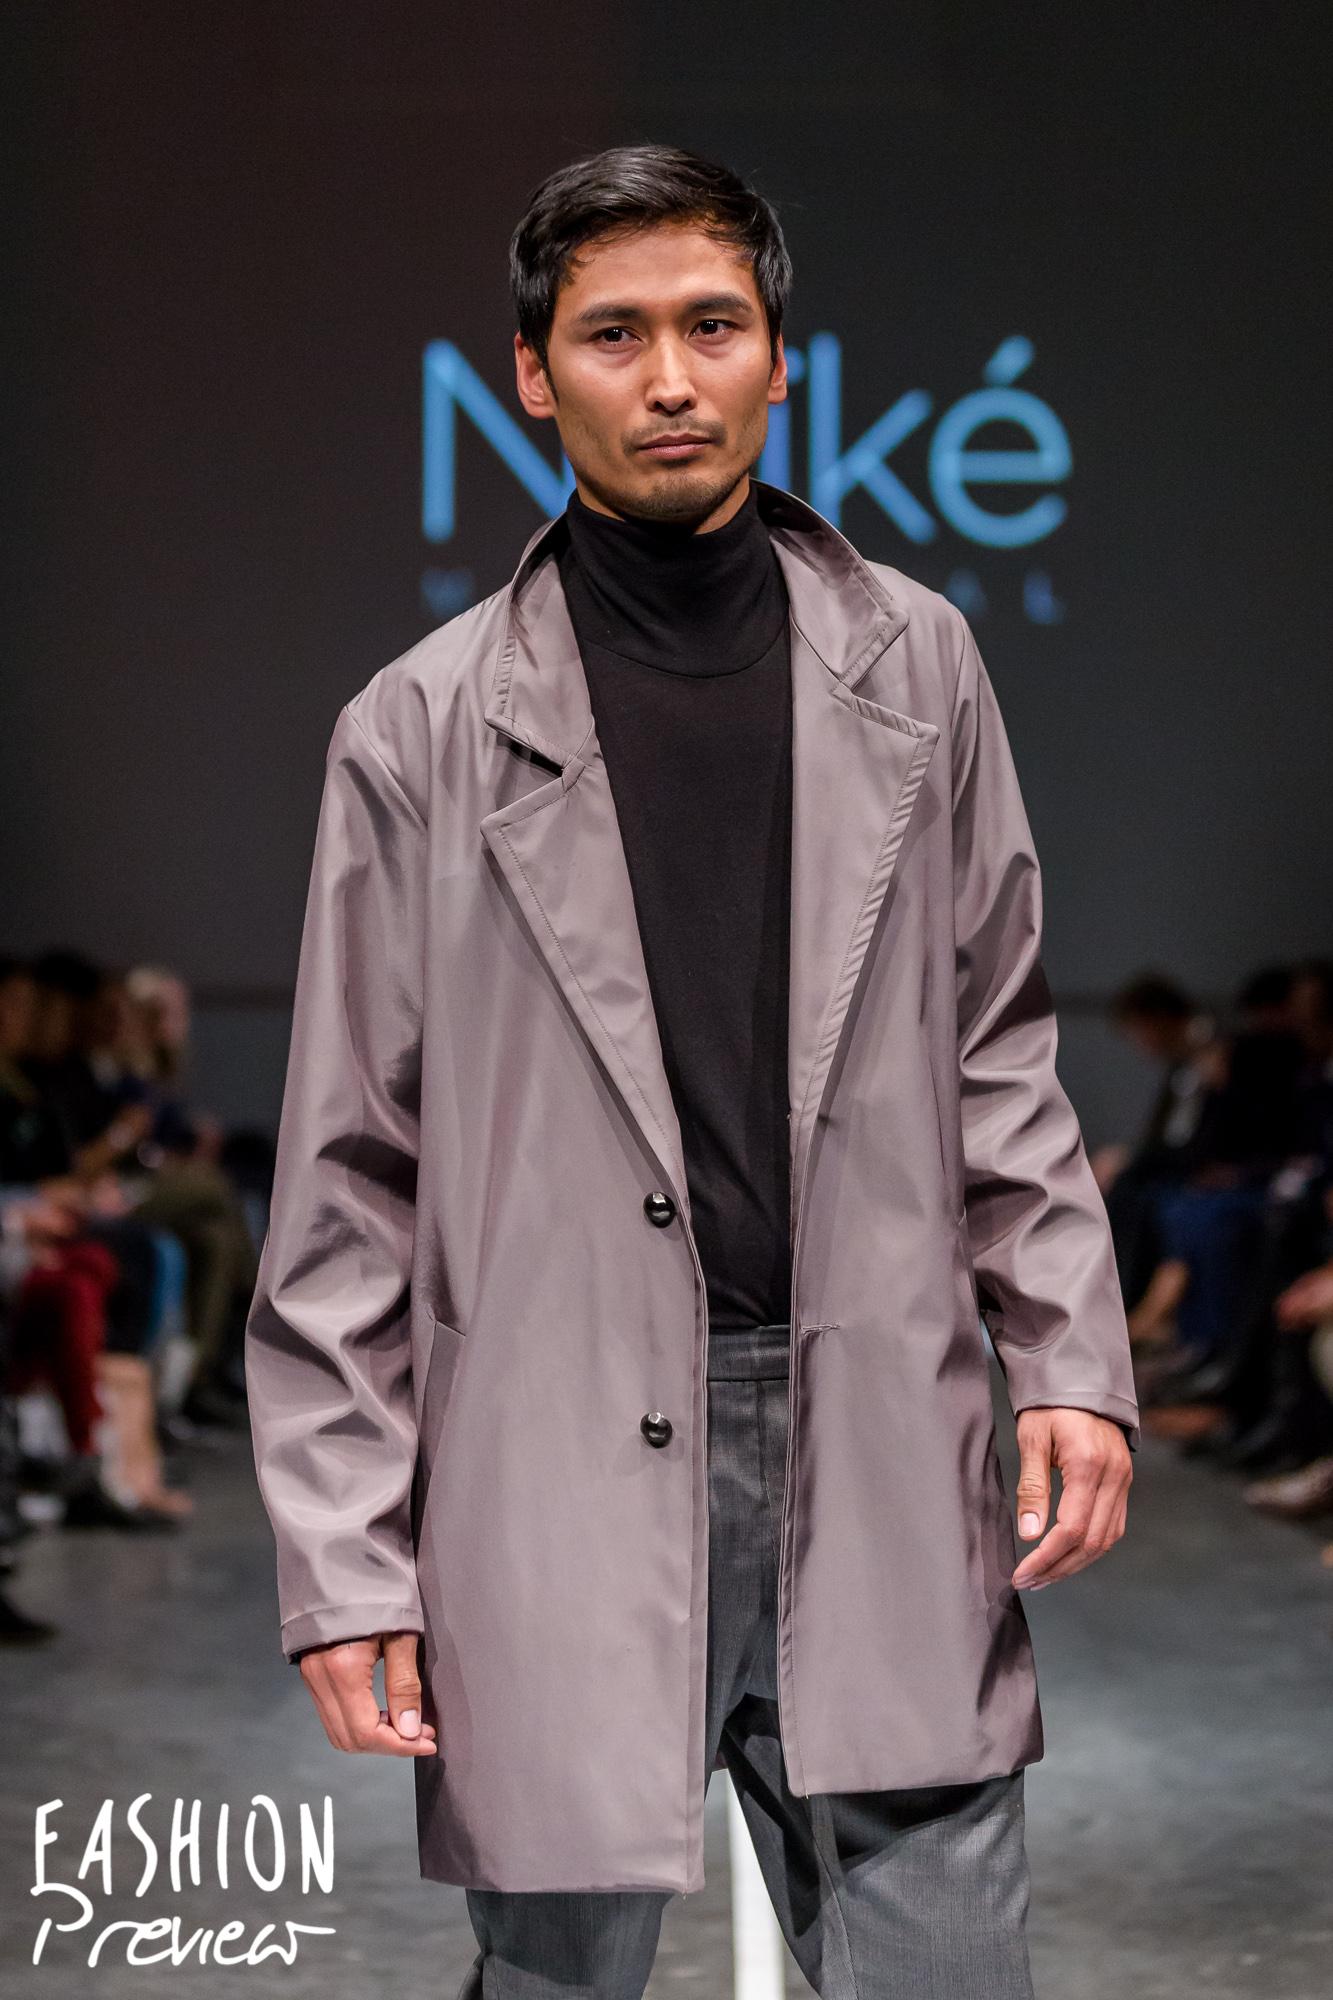 Fashion Preview 9 - Naike-33.jpg